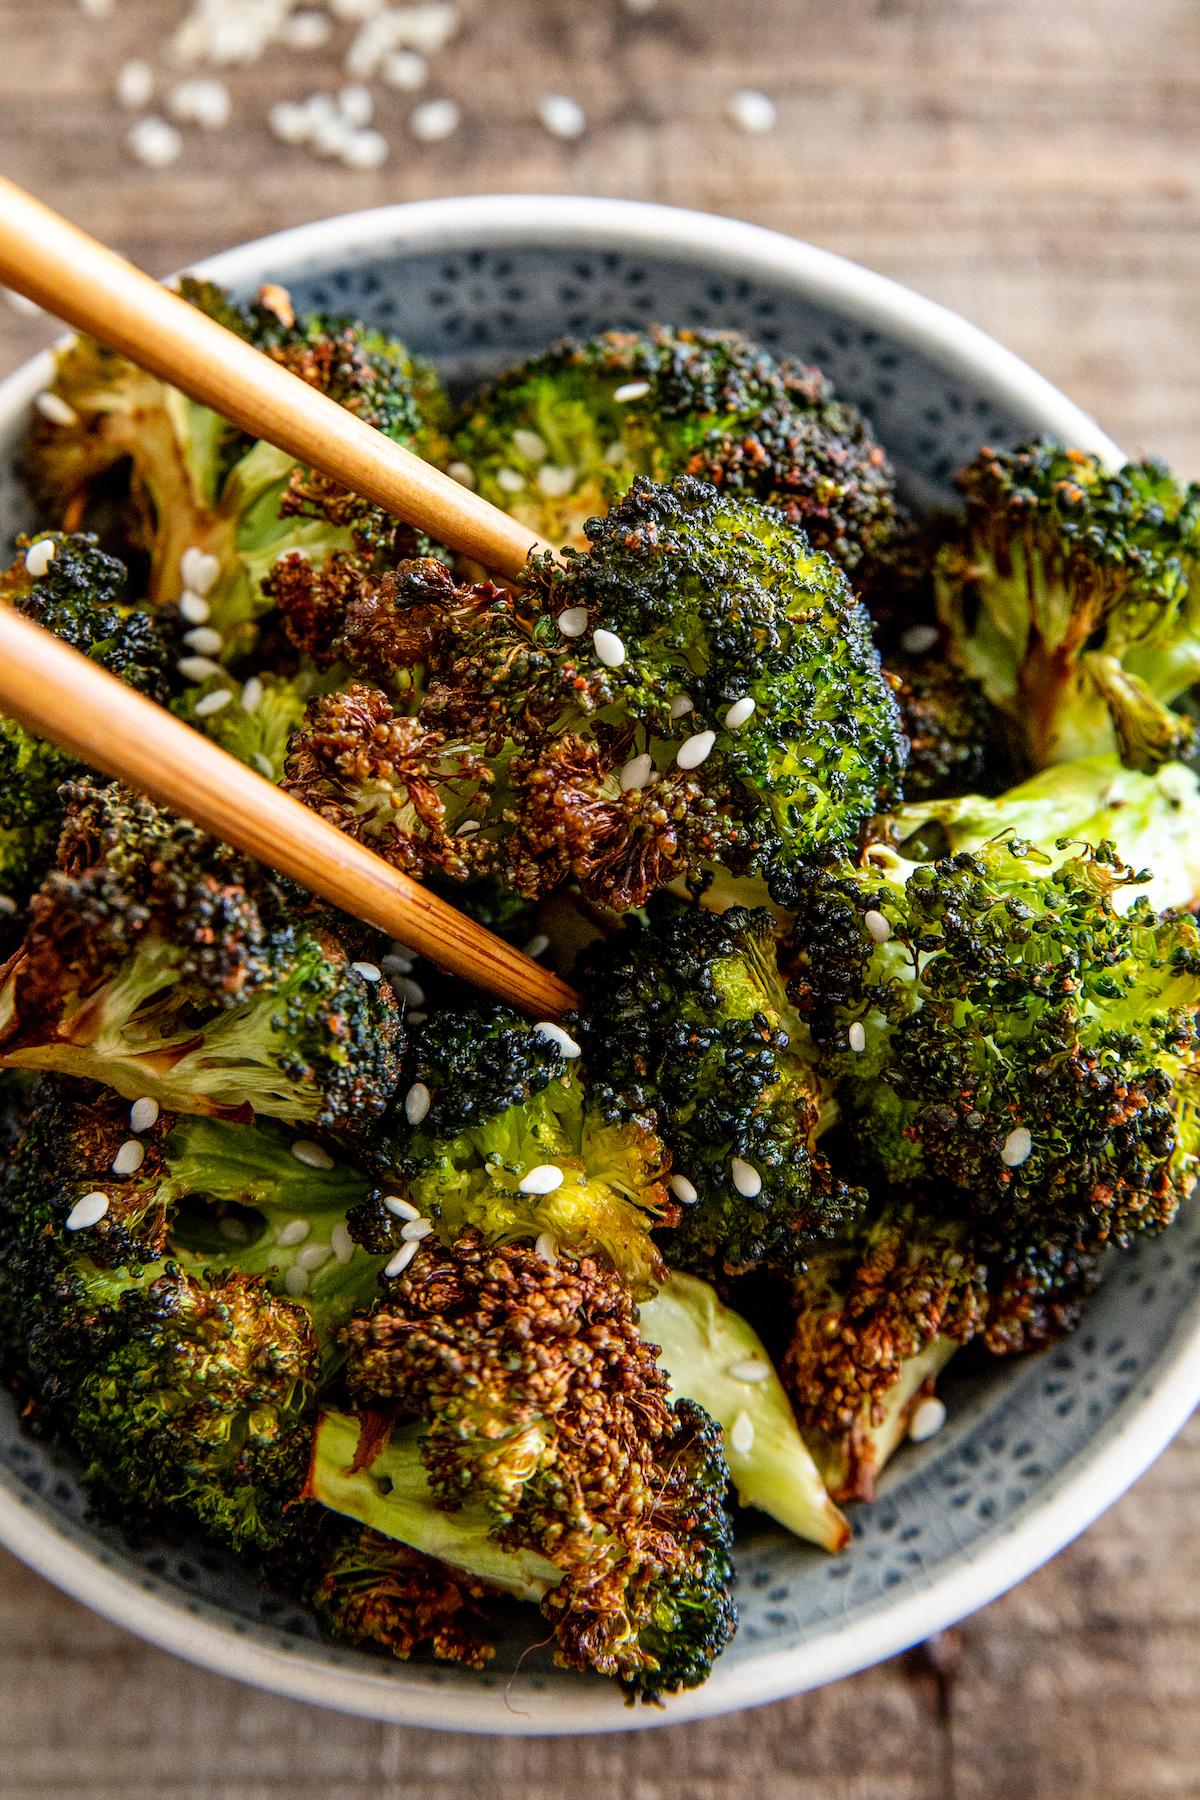 Roasted broccoli in chopsticks.